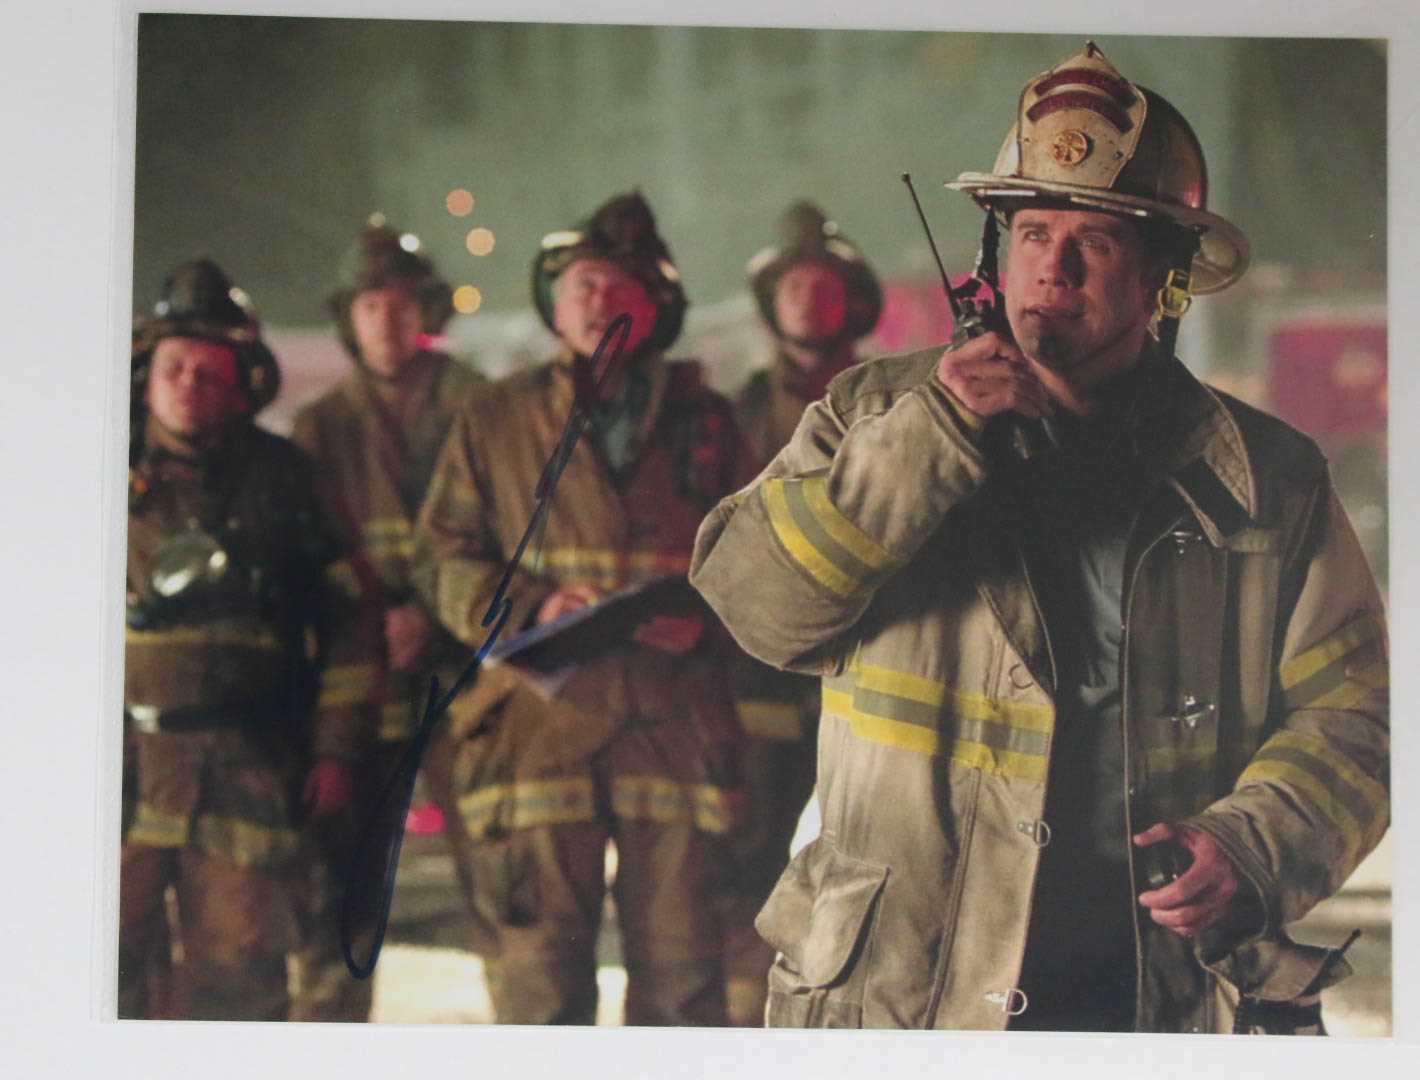 John Travolta Signed Autographed Quotladder 49quot Glossy 8x10